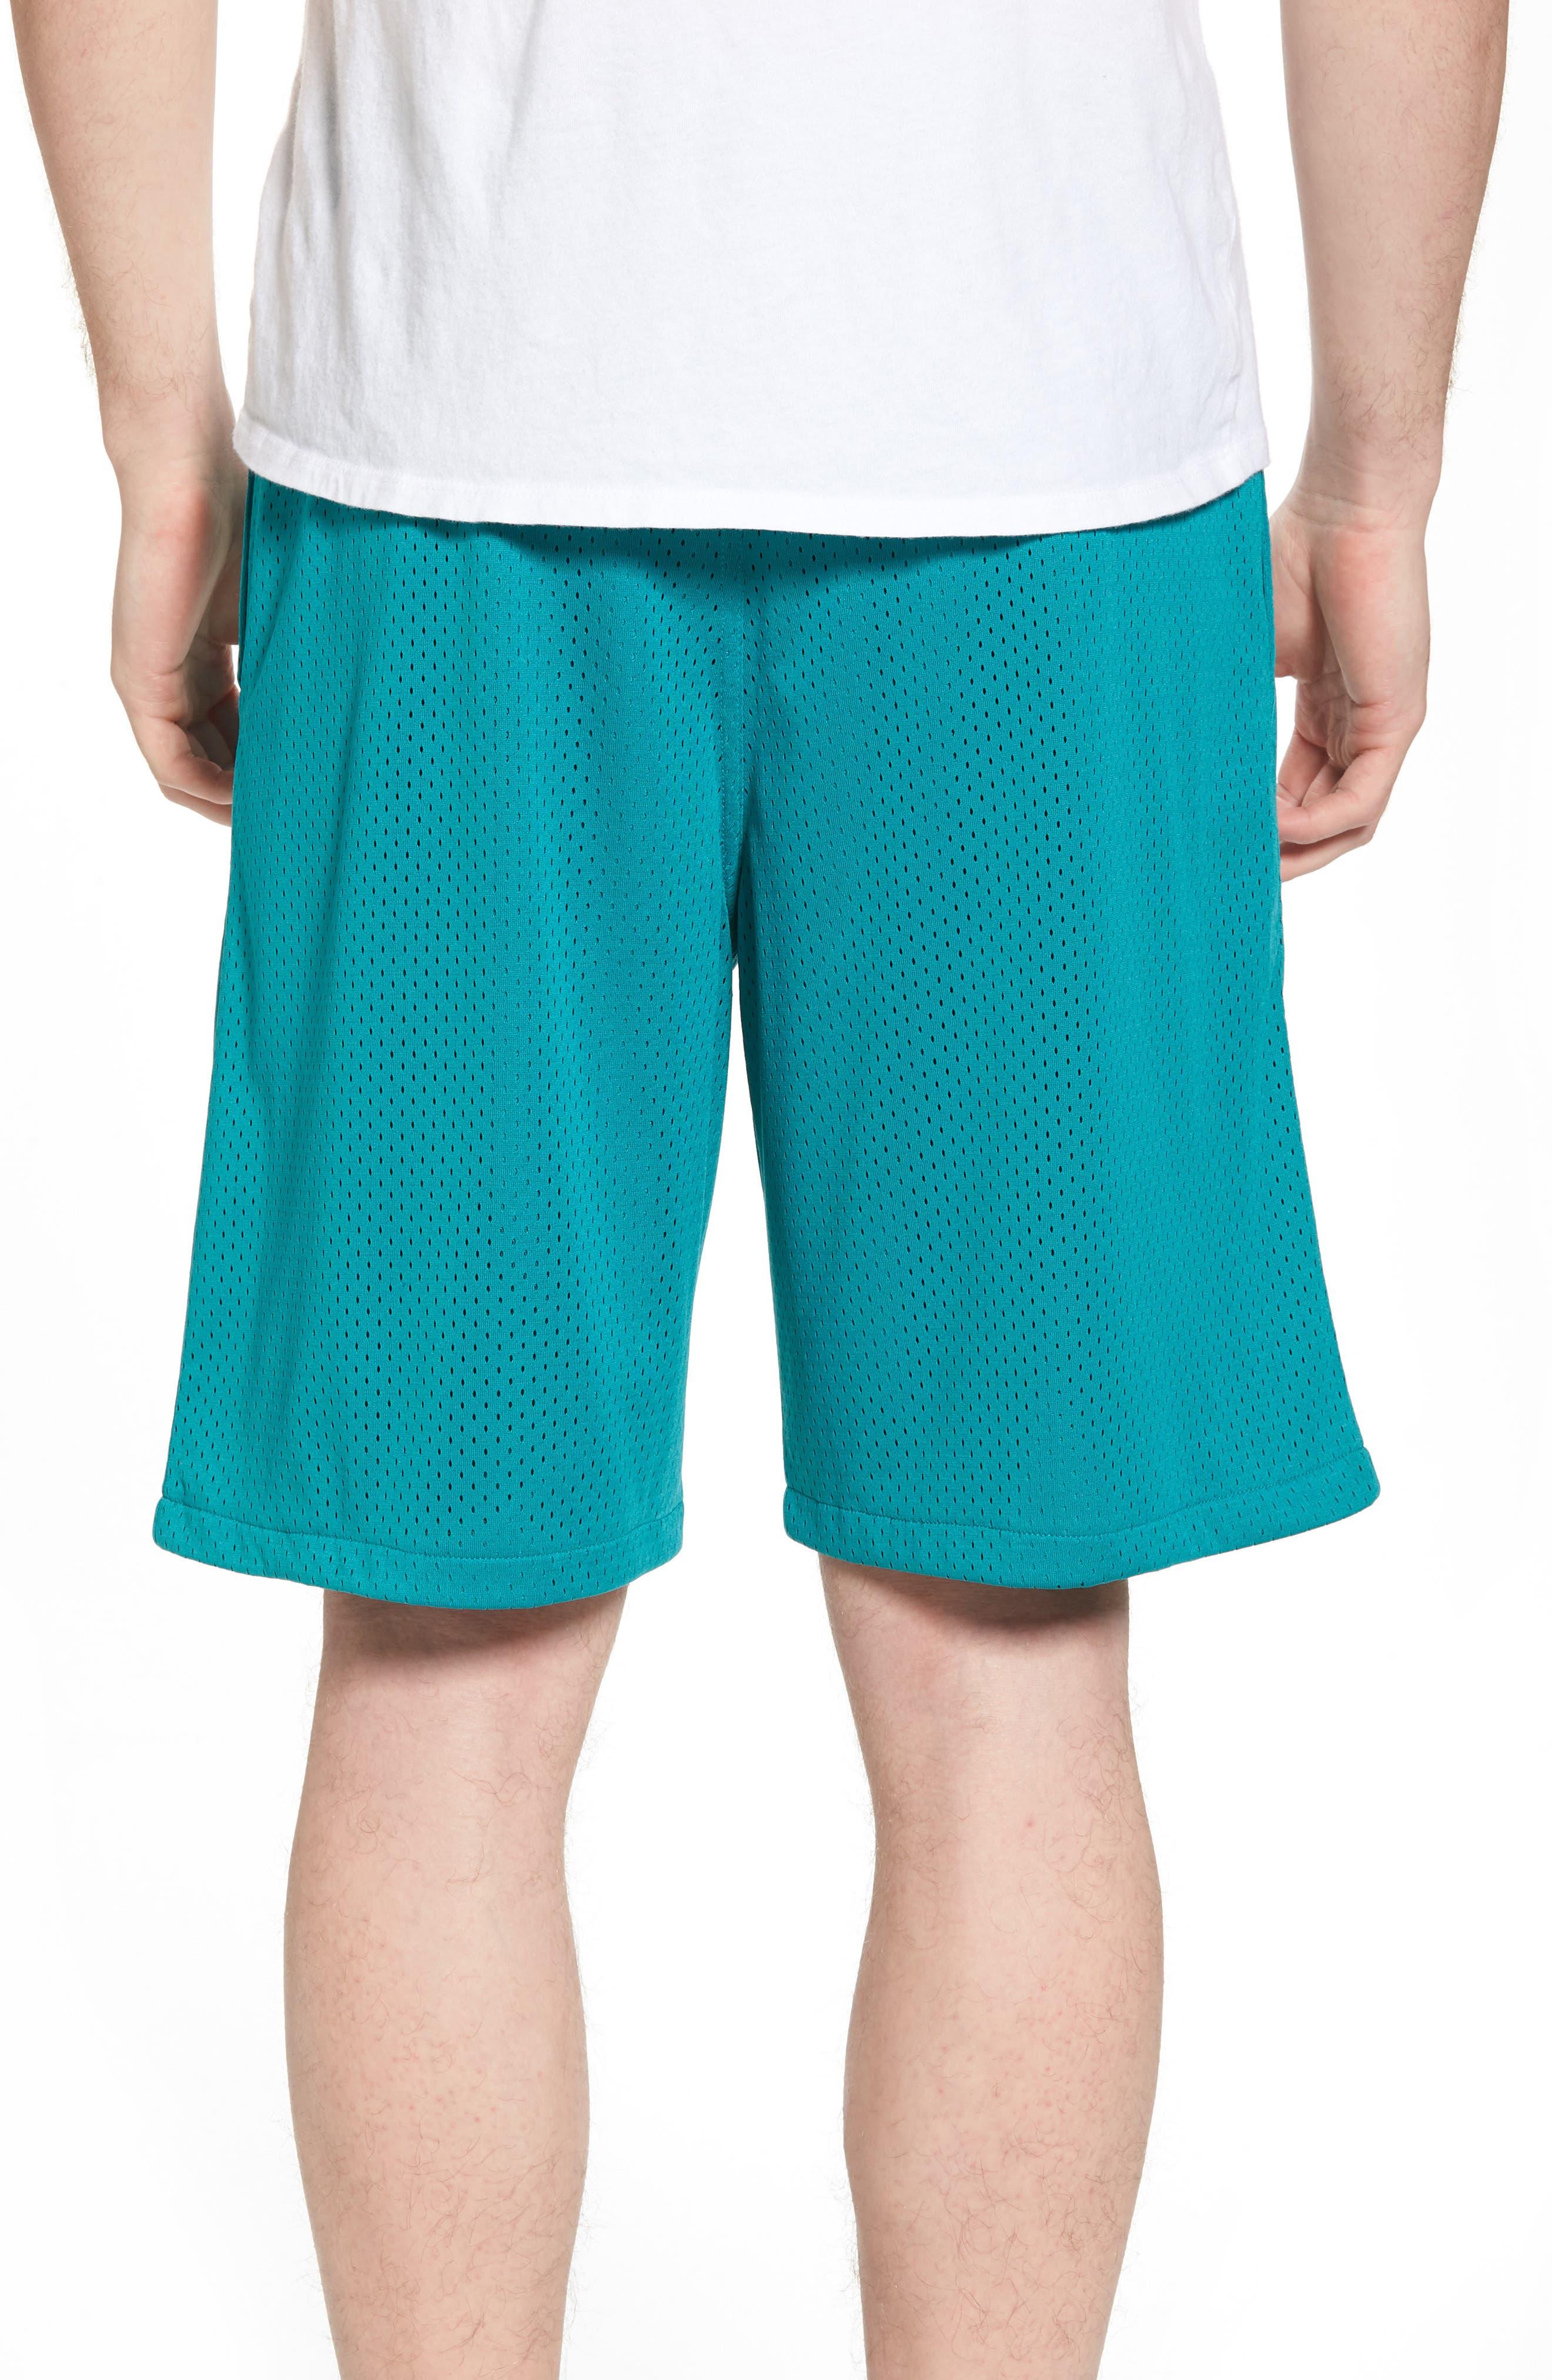 O.P.E. Athletic Shorts,                             Alternate thumbnail 2, color,                             445